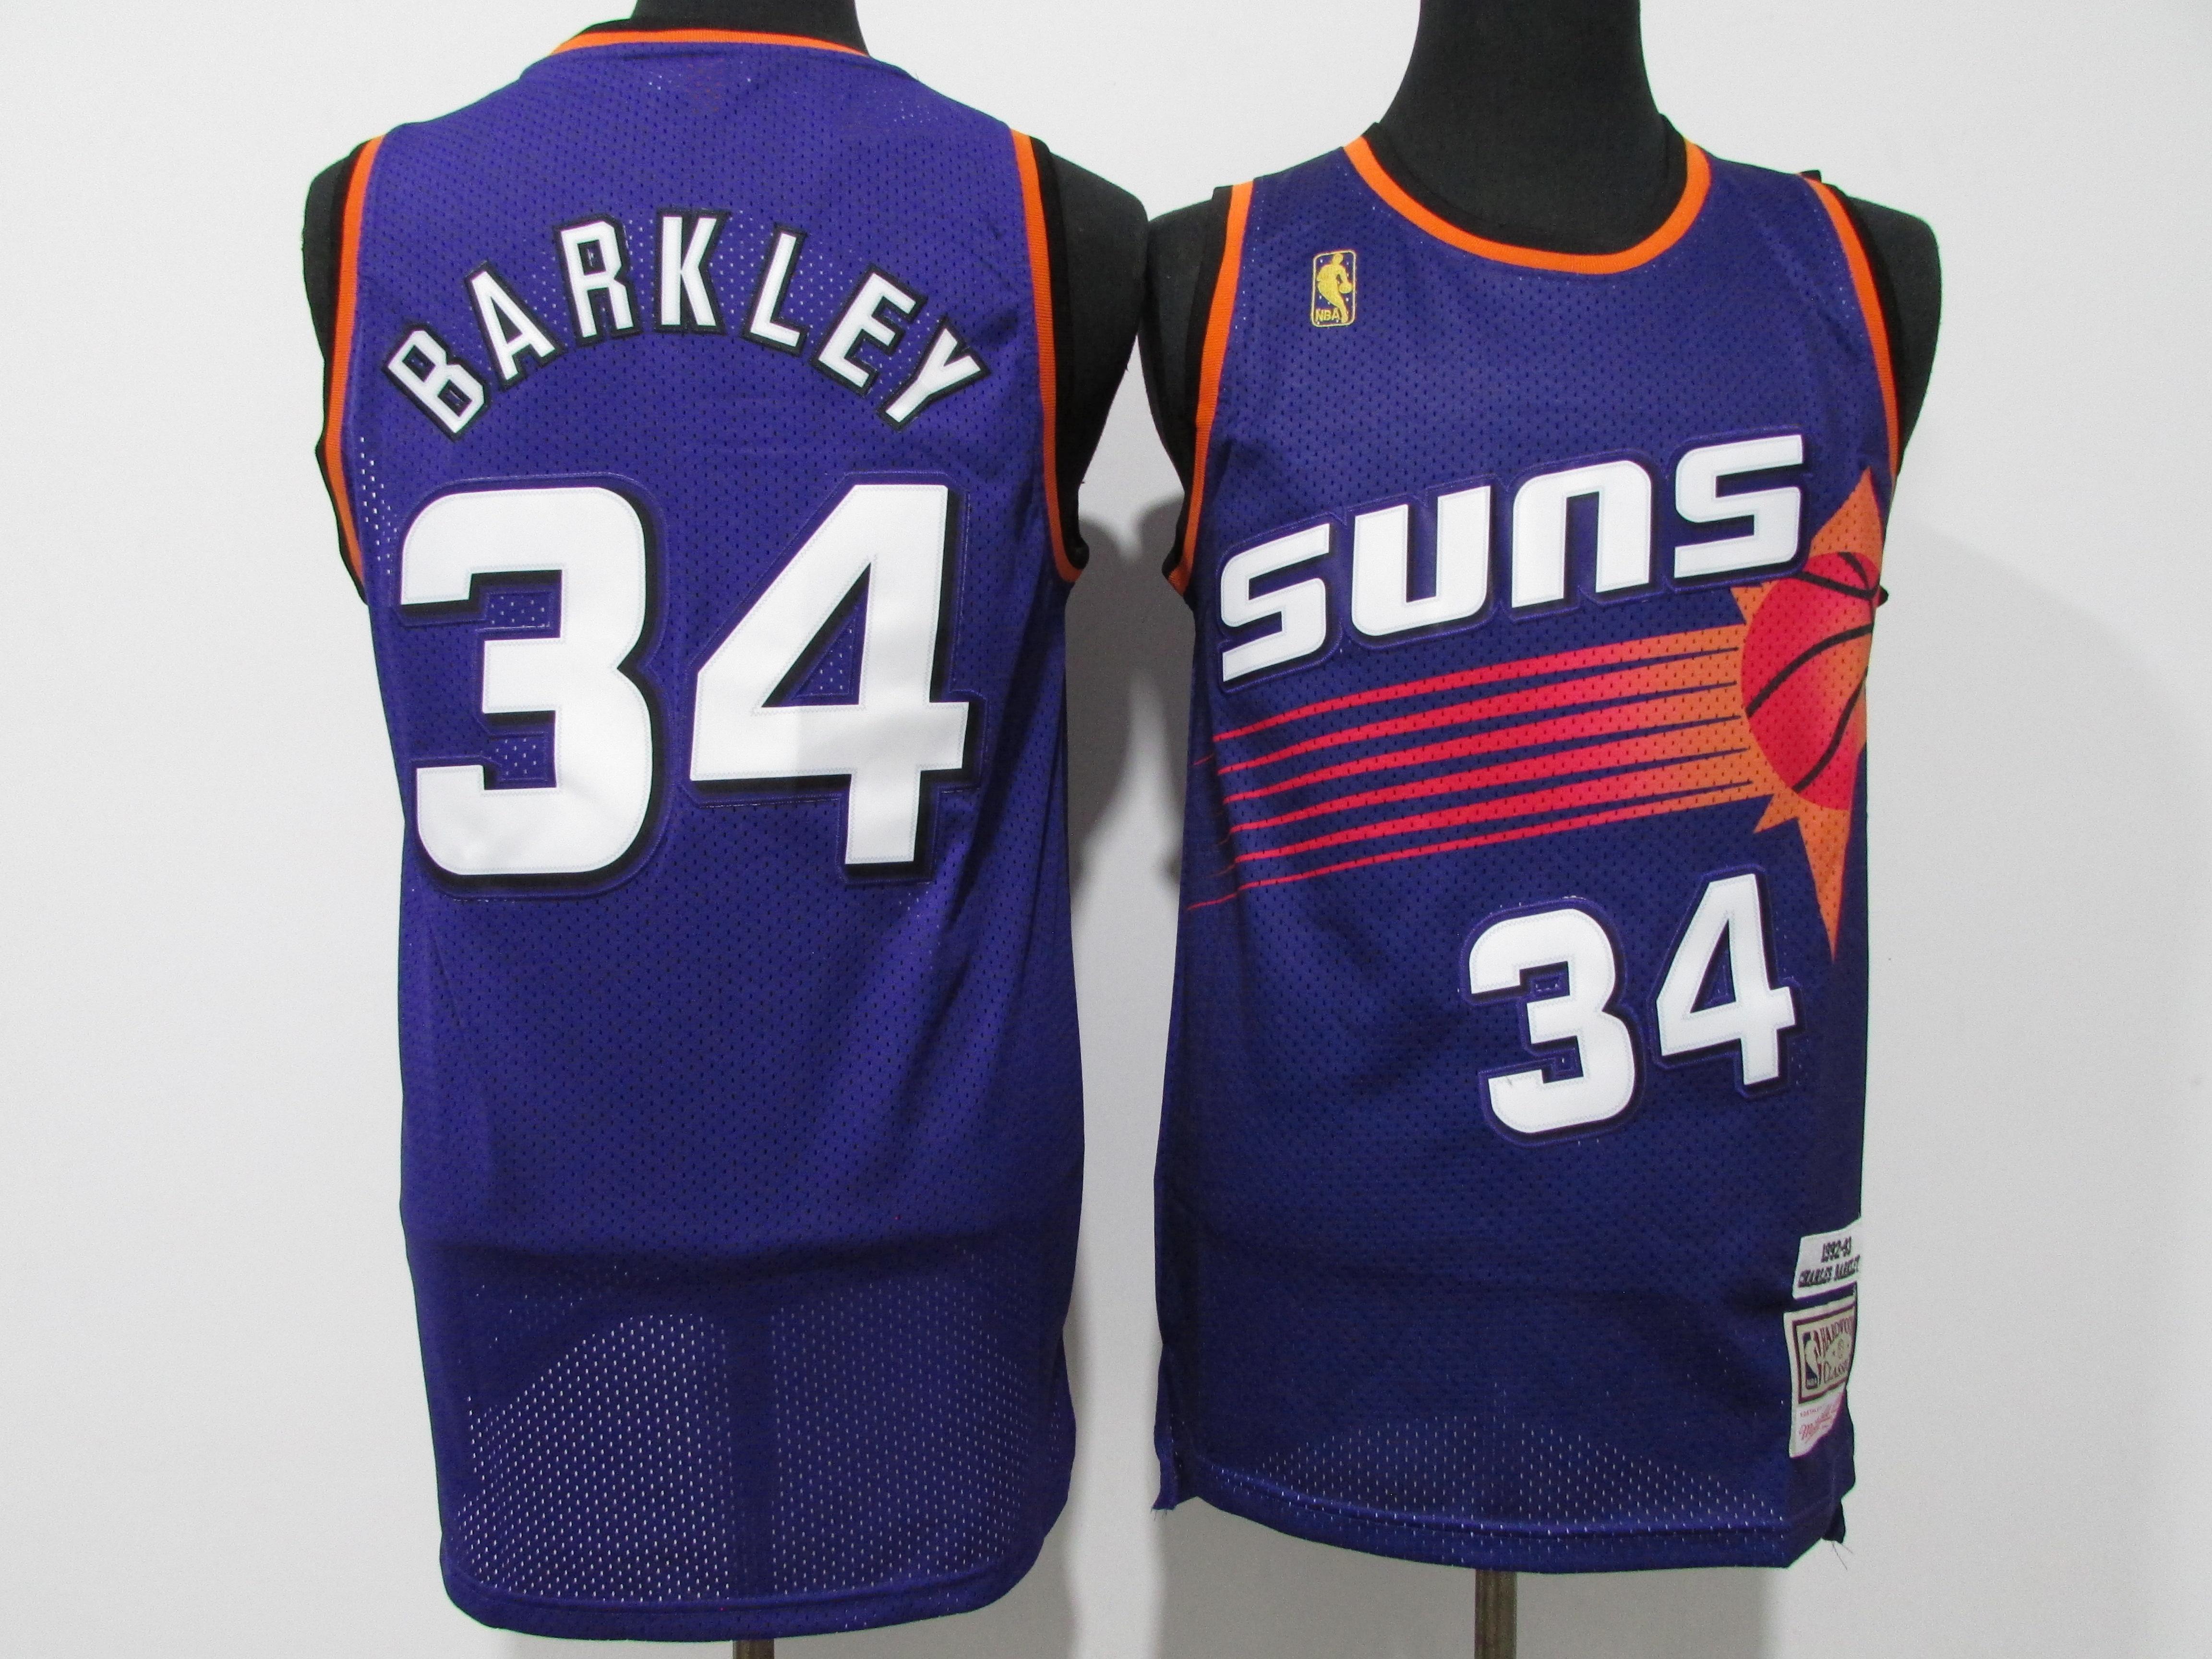 Suns 34 Charles Barkley Purple Hardwood Classics Jersey